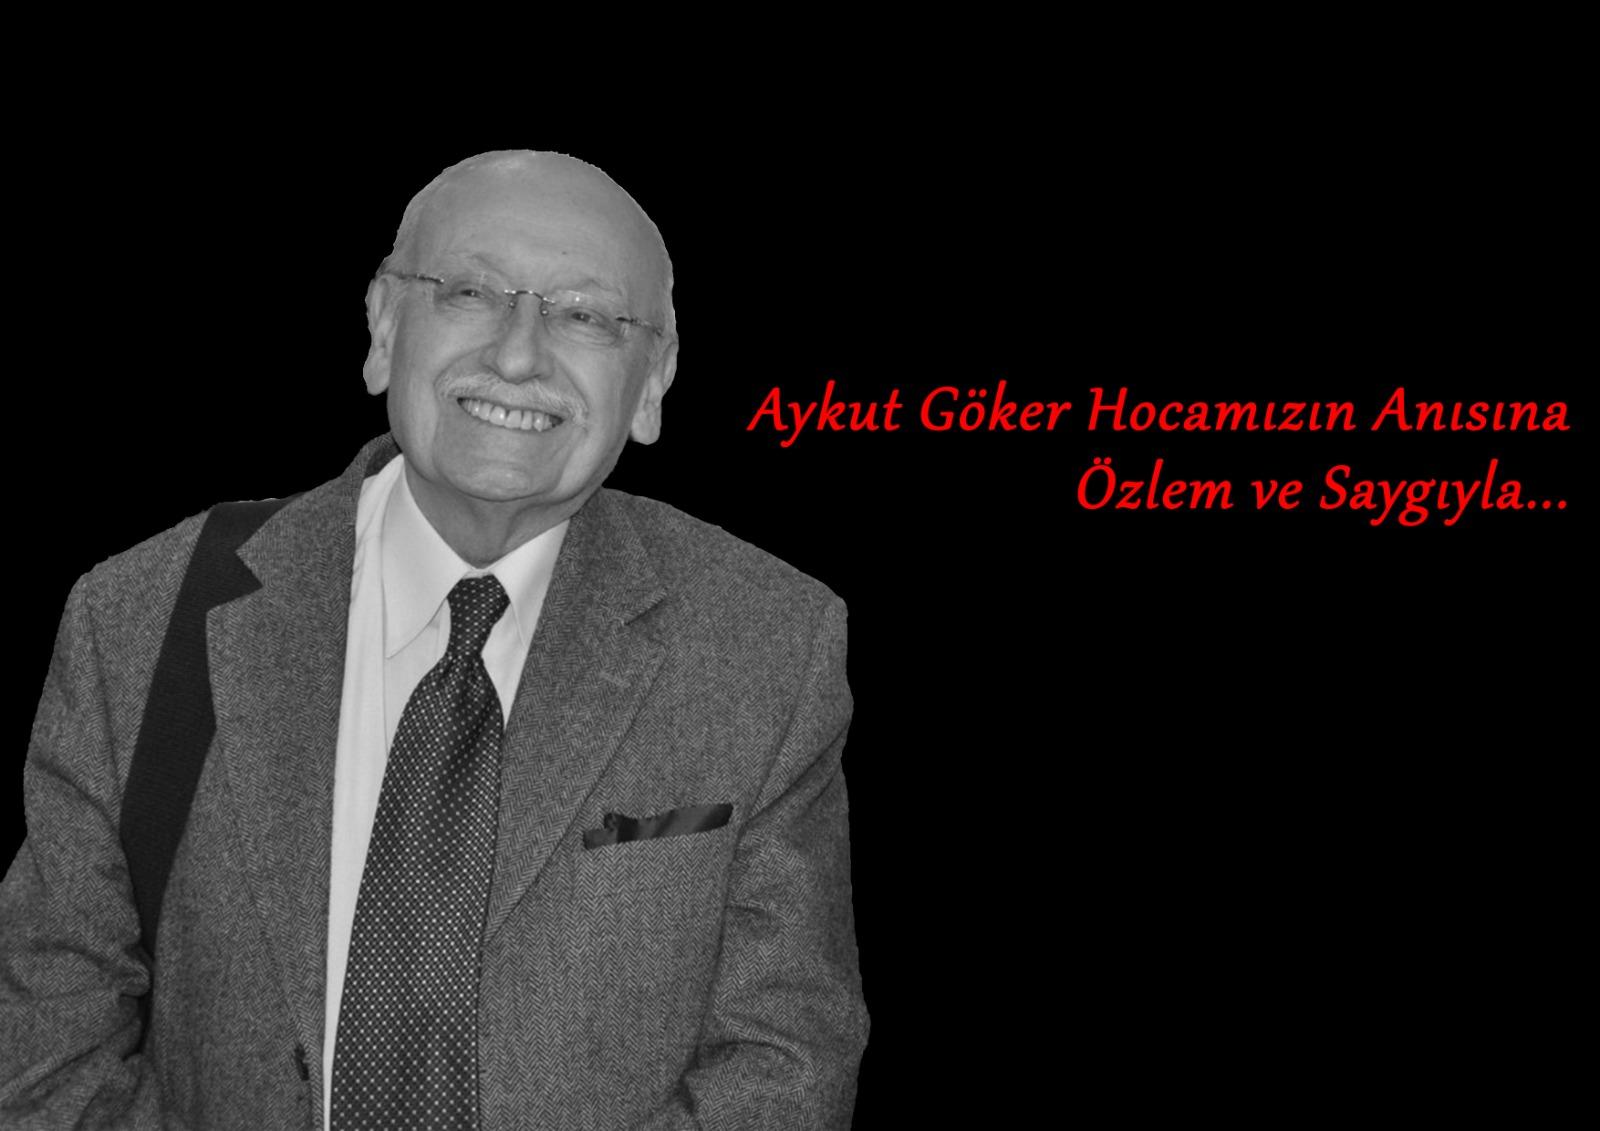 Aykut Goker